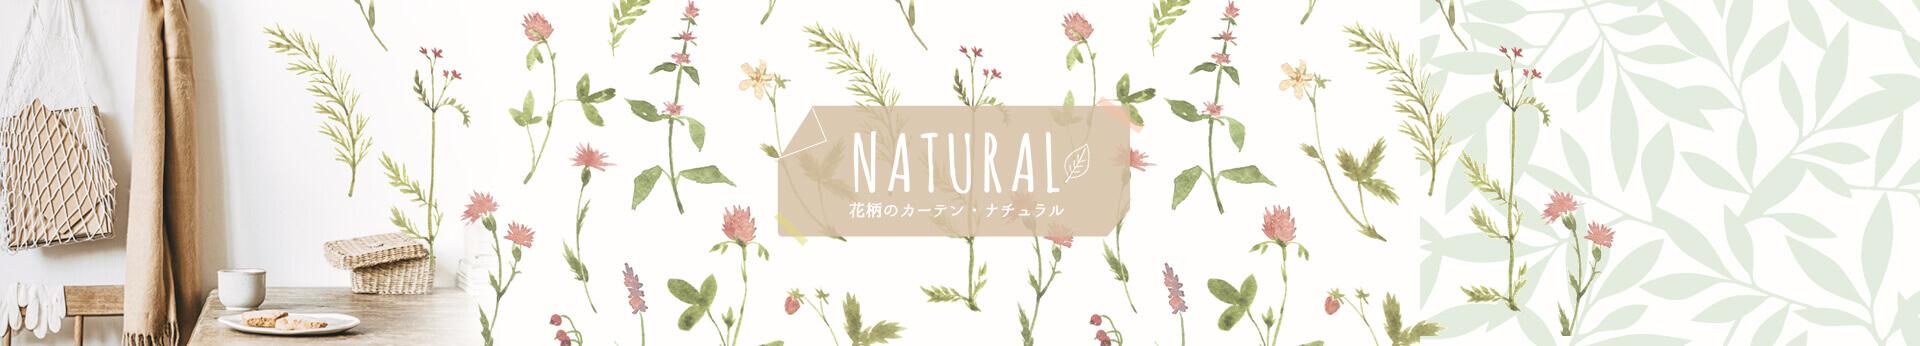 NATURAL 花柄のカーテン・ナチュラル